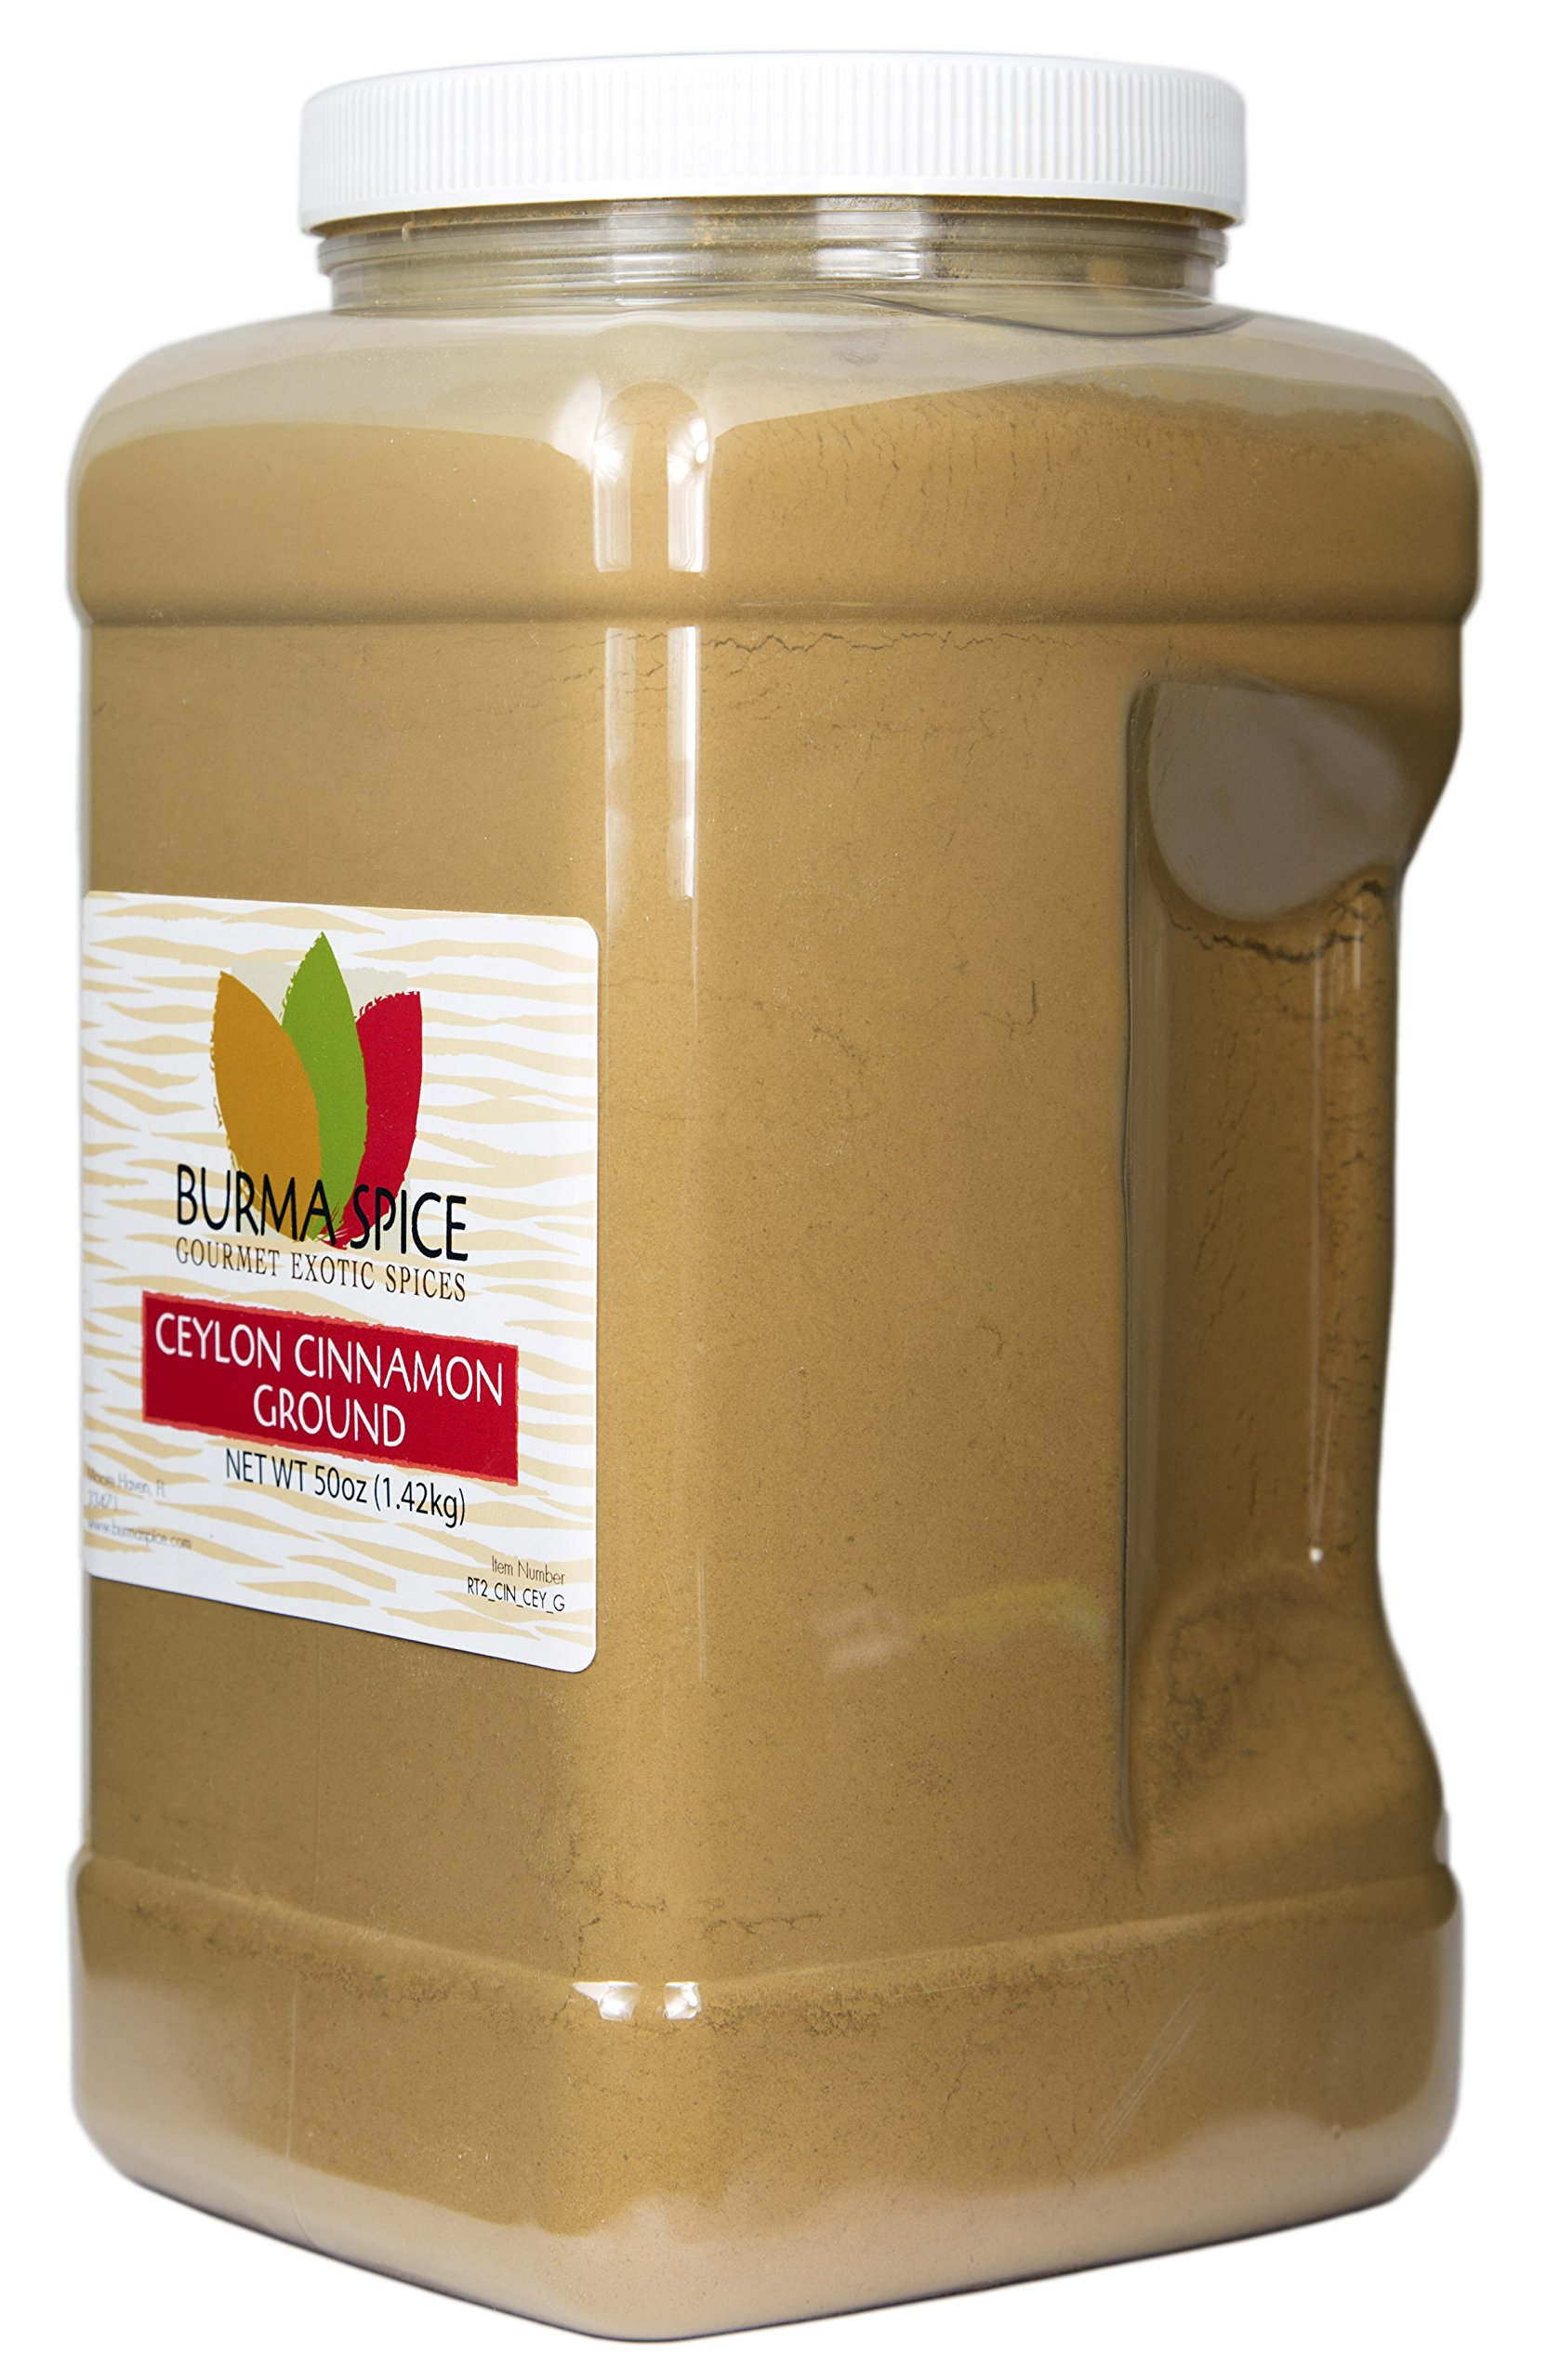 Ground Ceylon Cinnamon   Very freshly ground   Highest Premium Grade   100% Pure with no additives   Kosher Certified (50oz) by Burma Spice (Image #1)